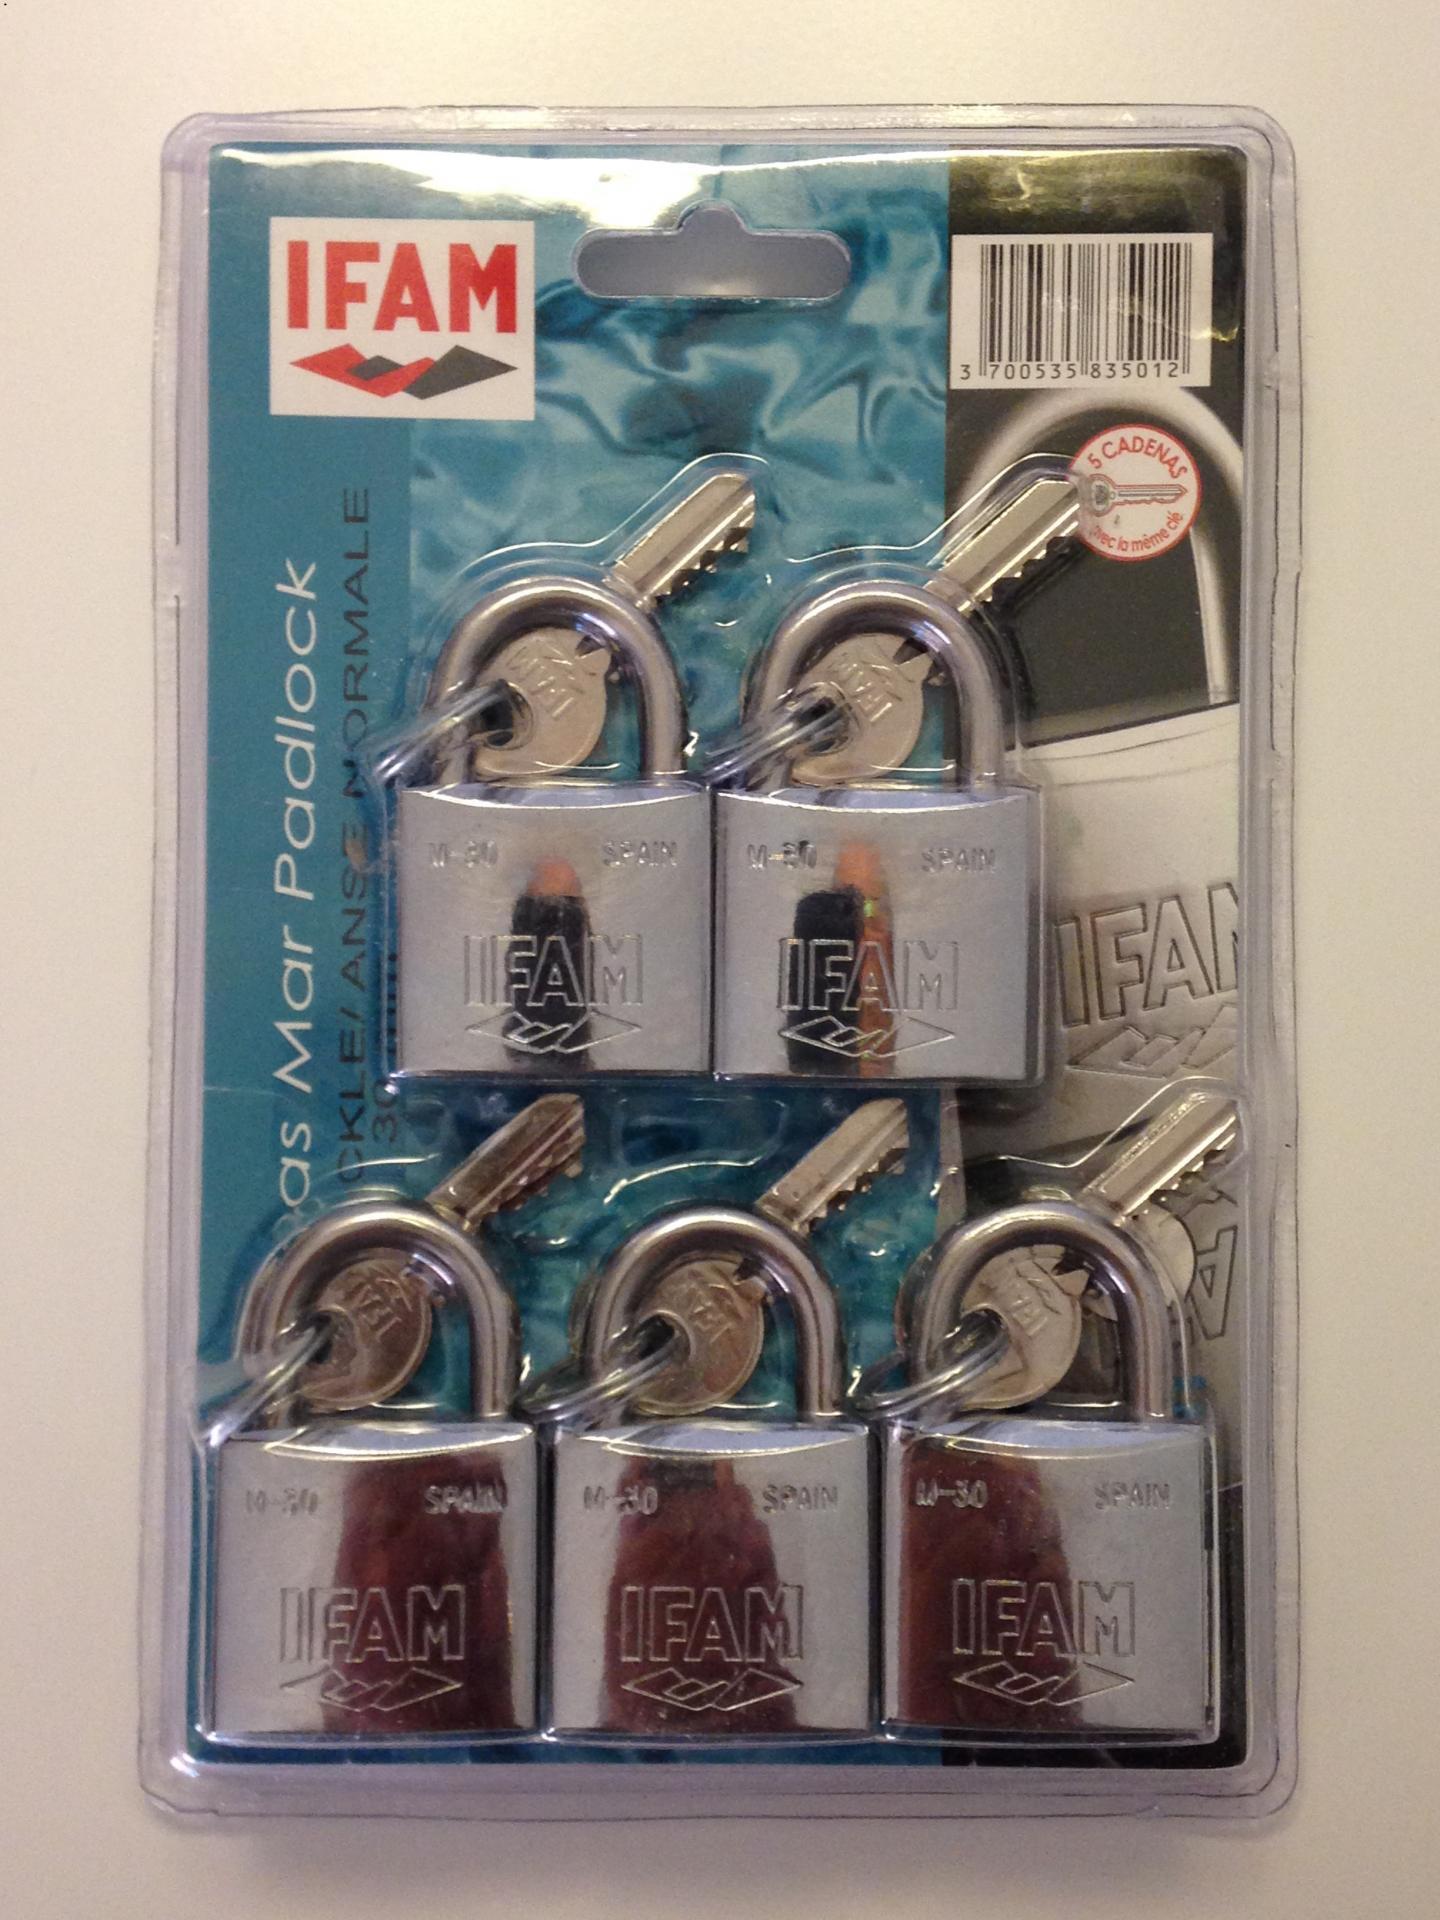 Lot de 5 cadenas inox m 30 ifam 1